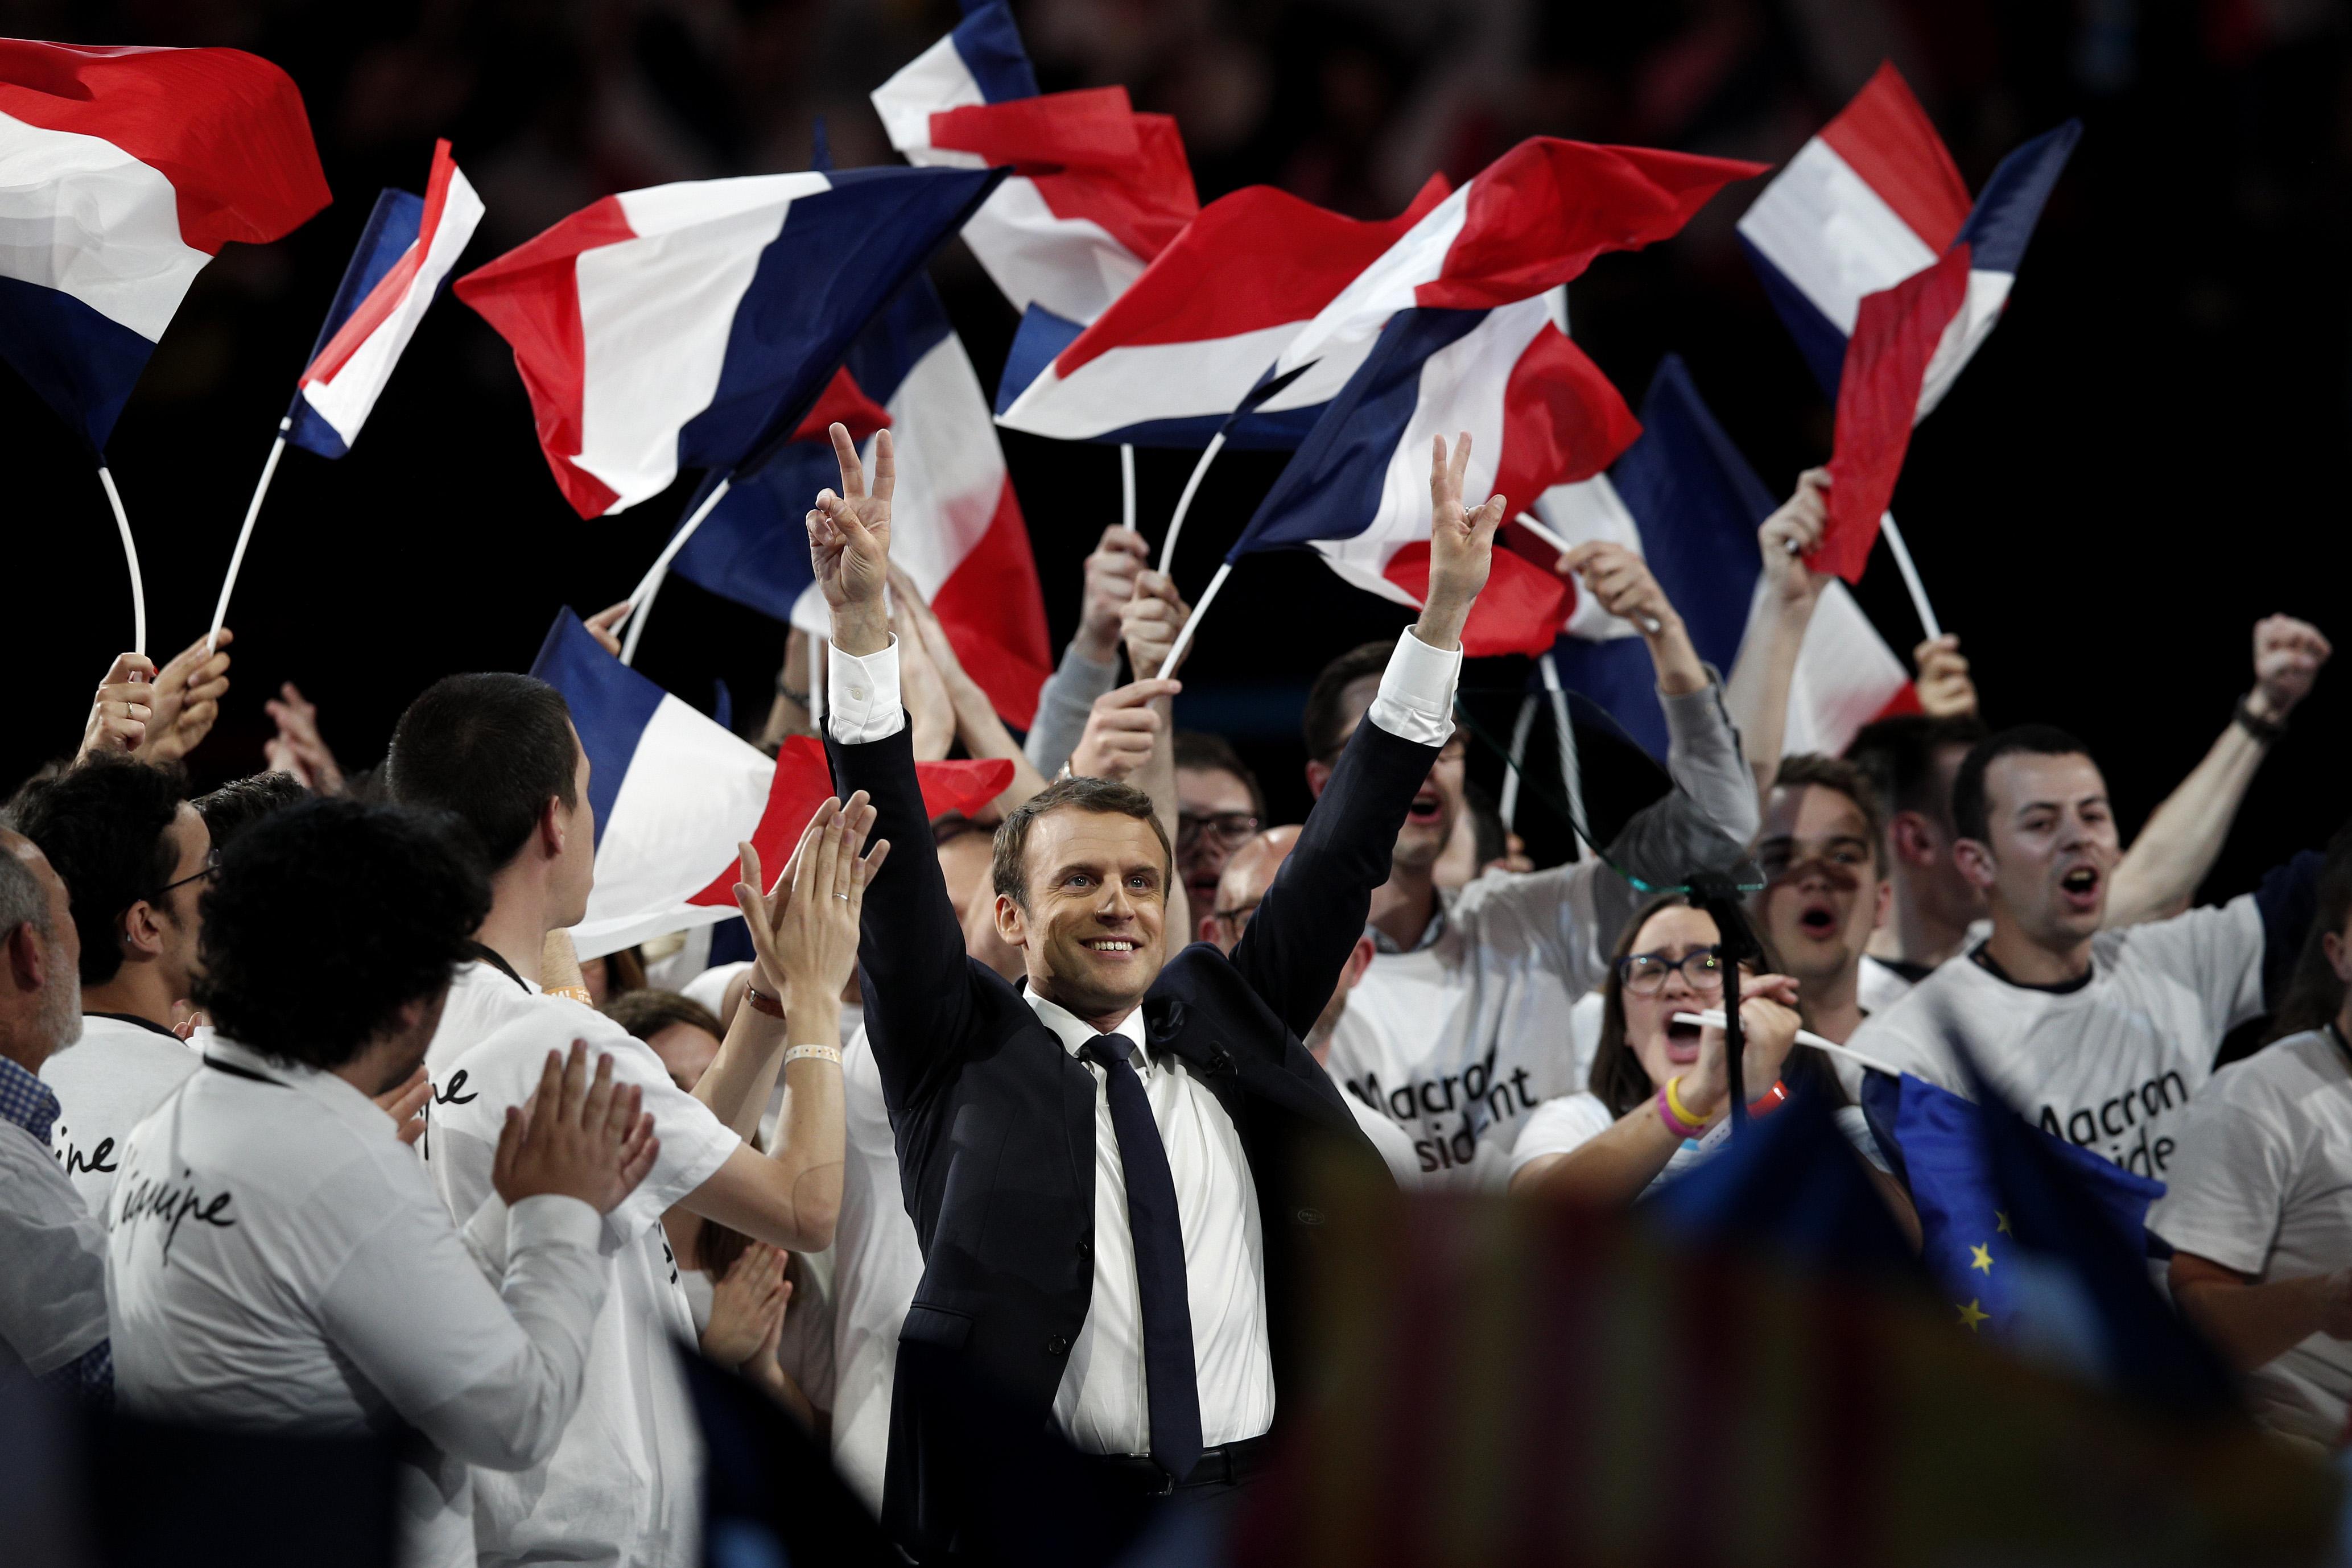 Portret | Emmanuel Macron, președinte al Franței